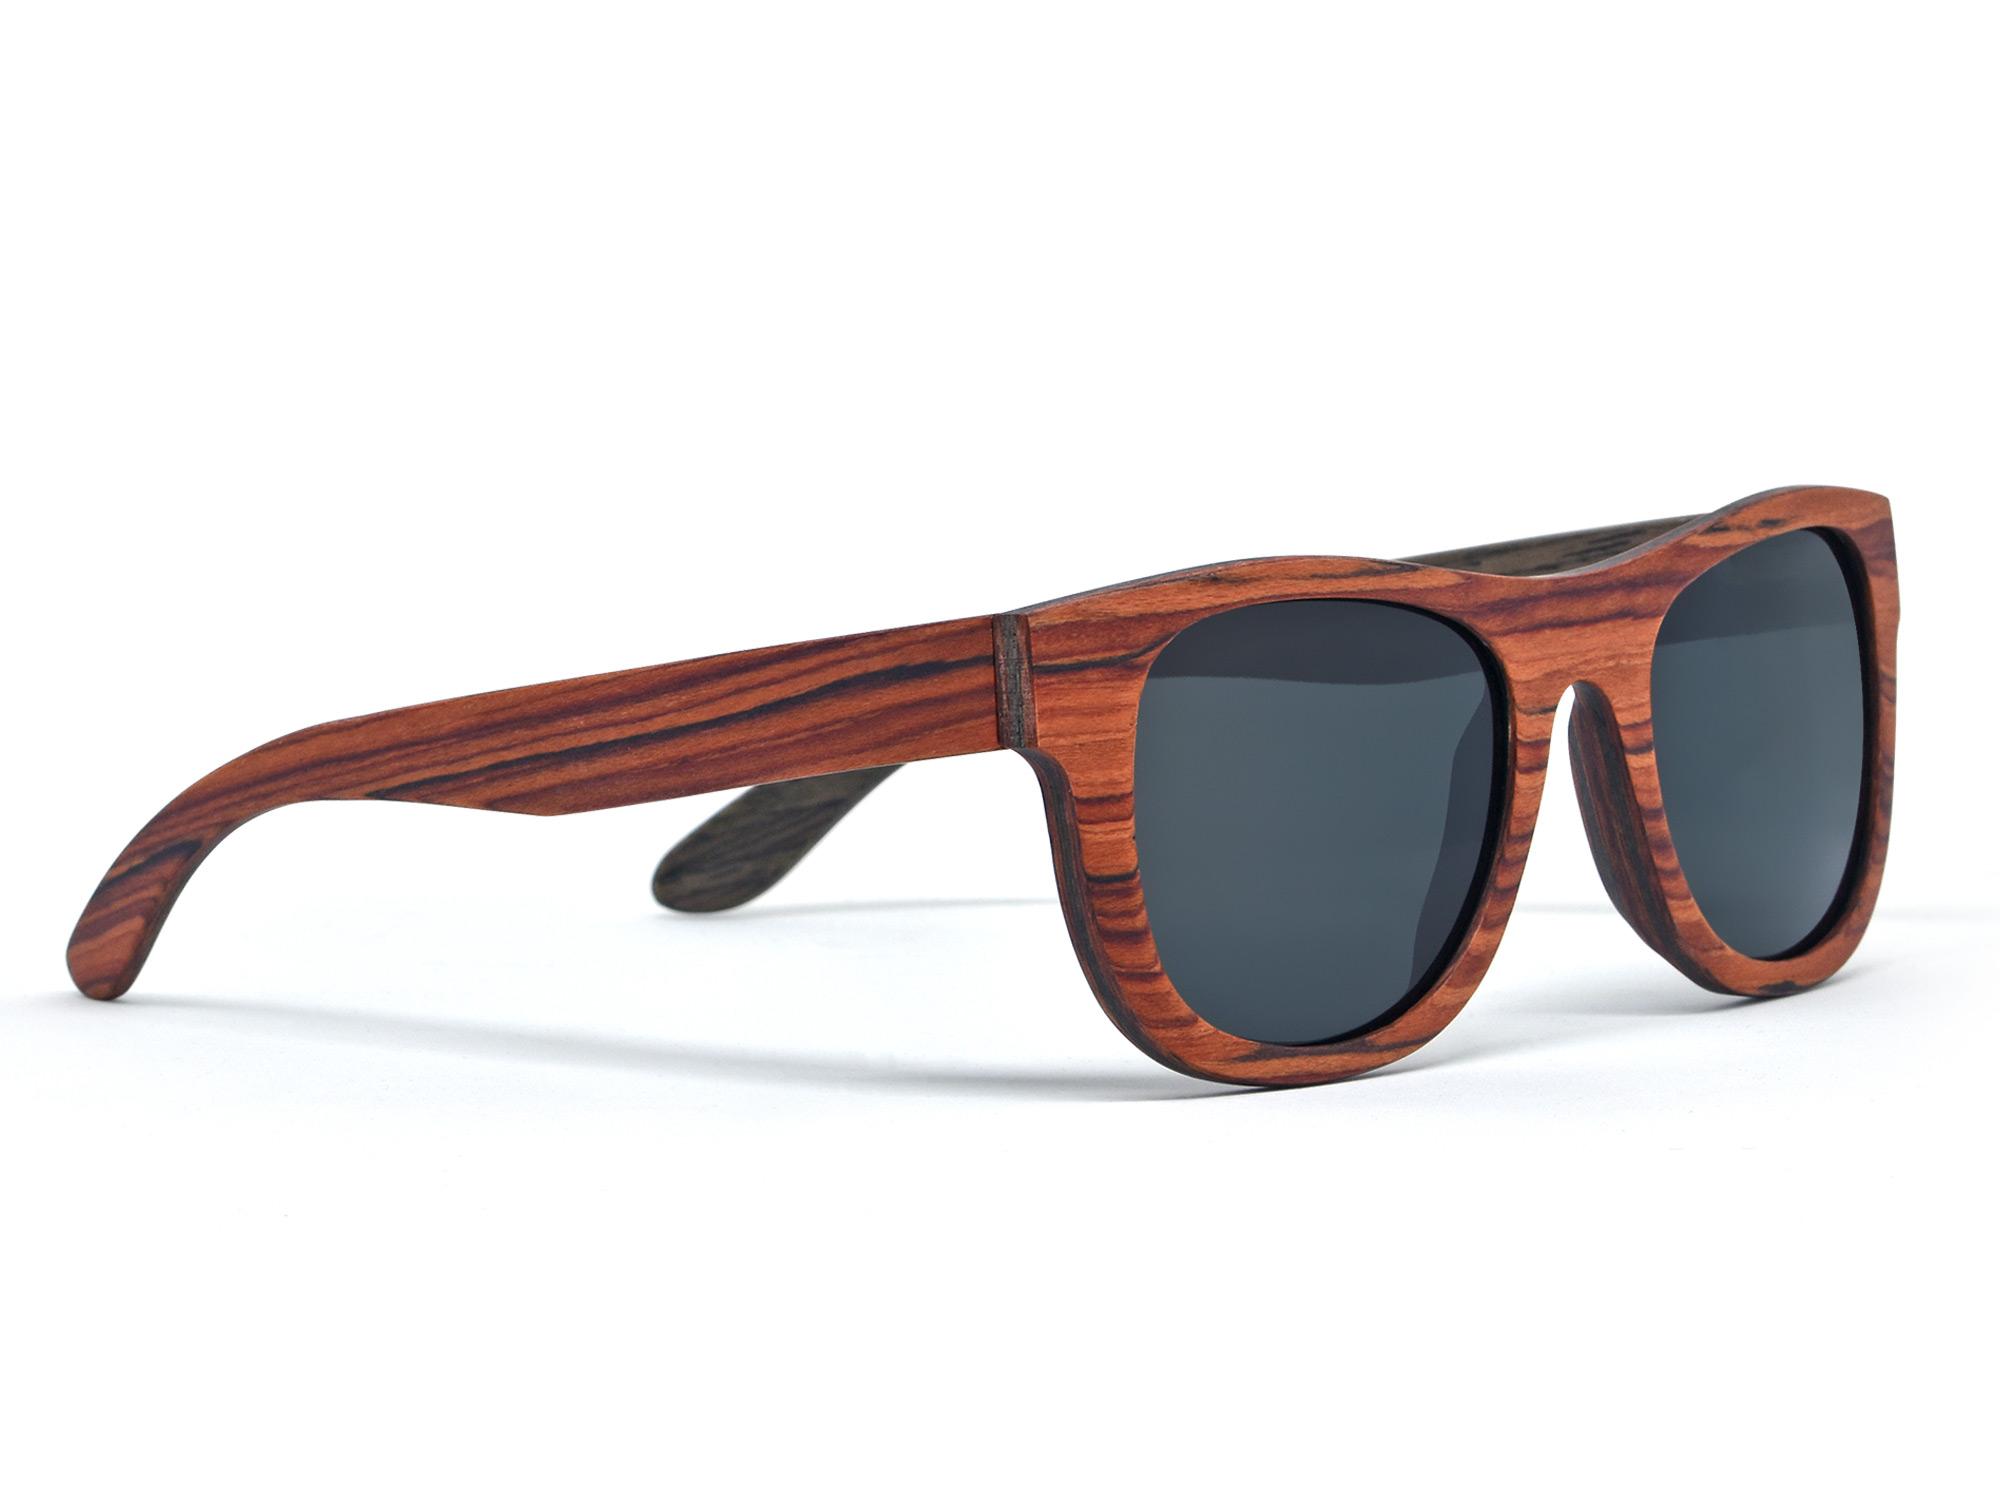 rosewood and walnut wood sunglasses